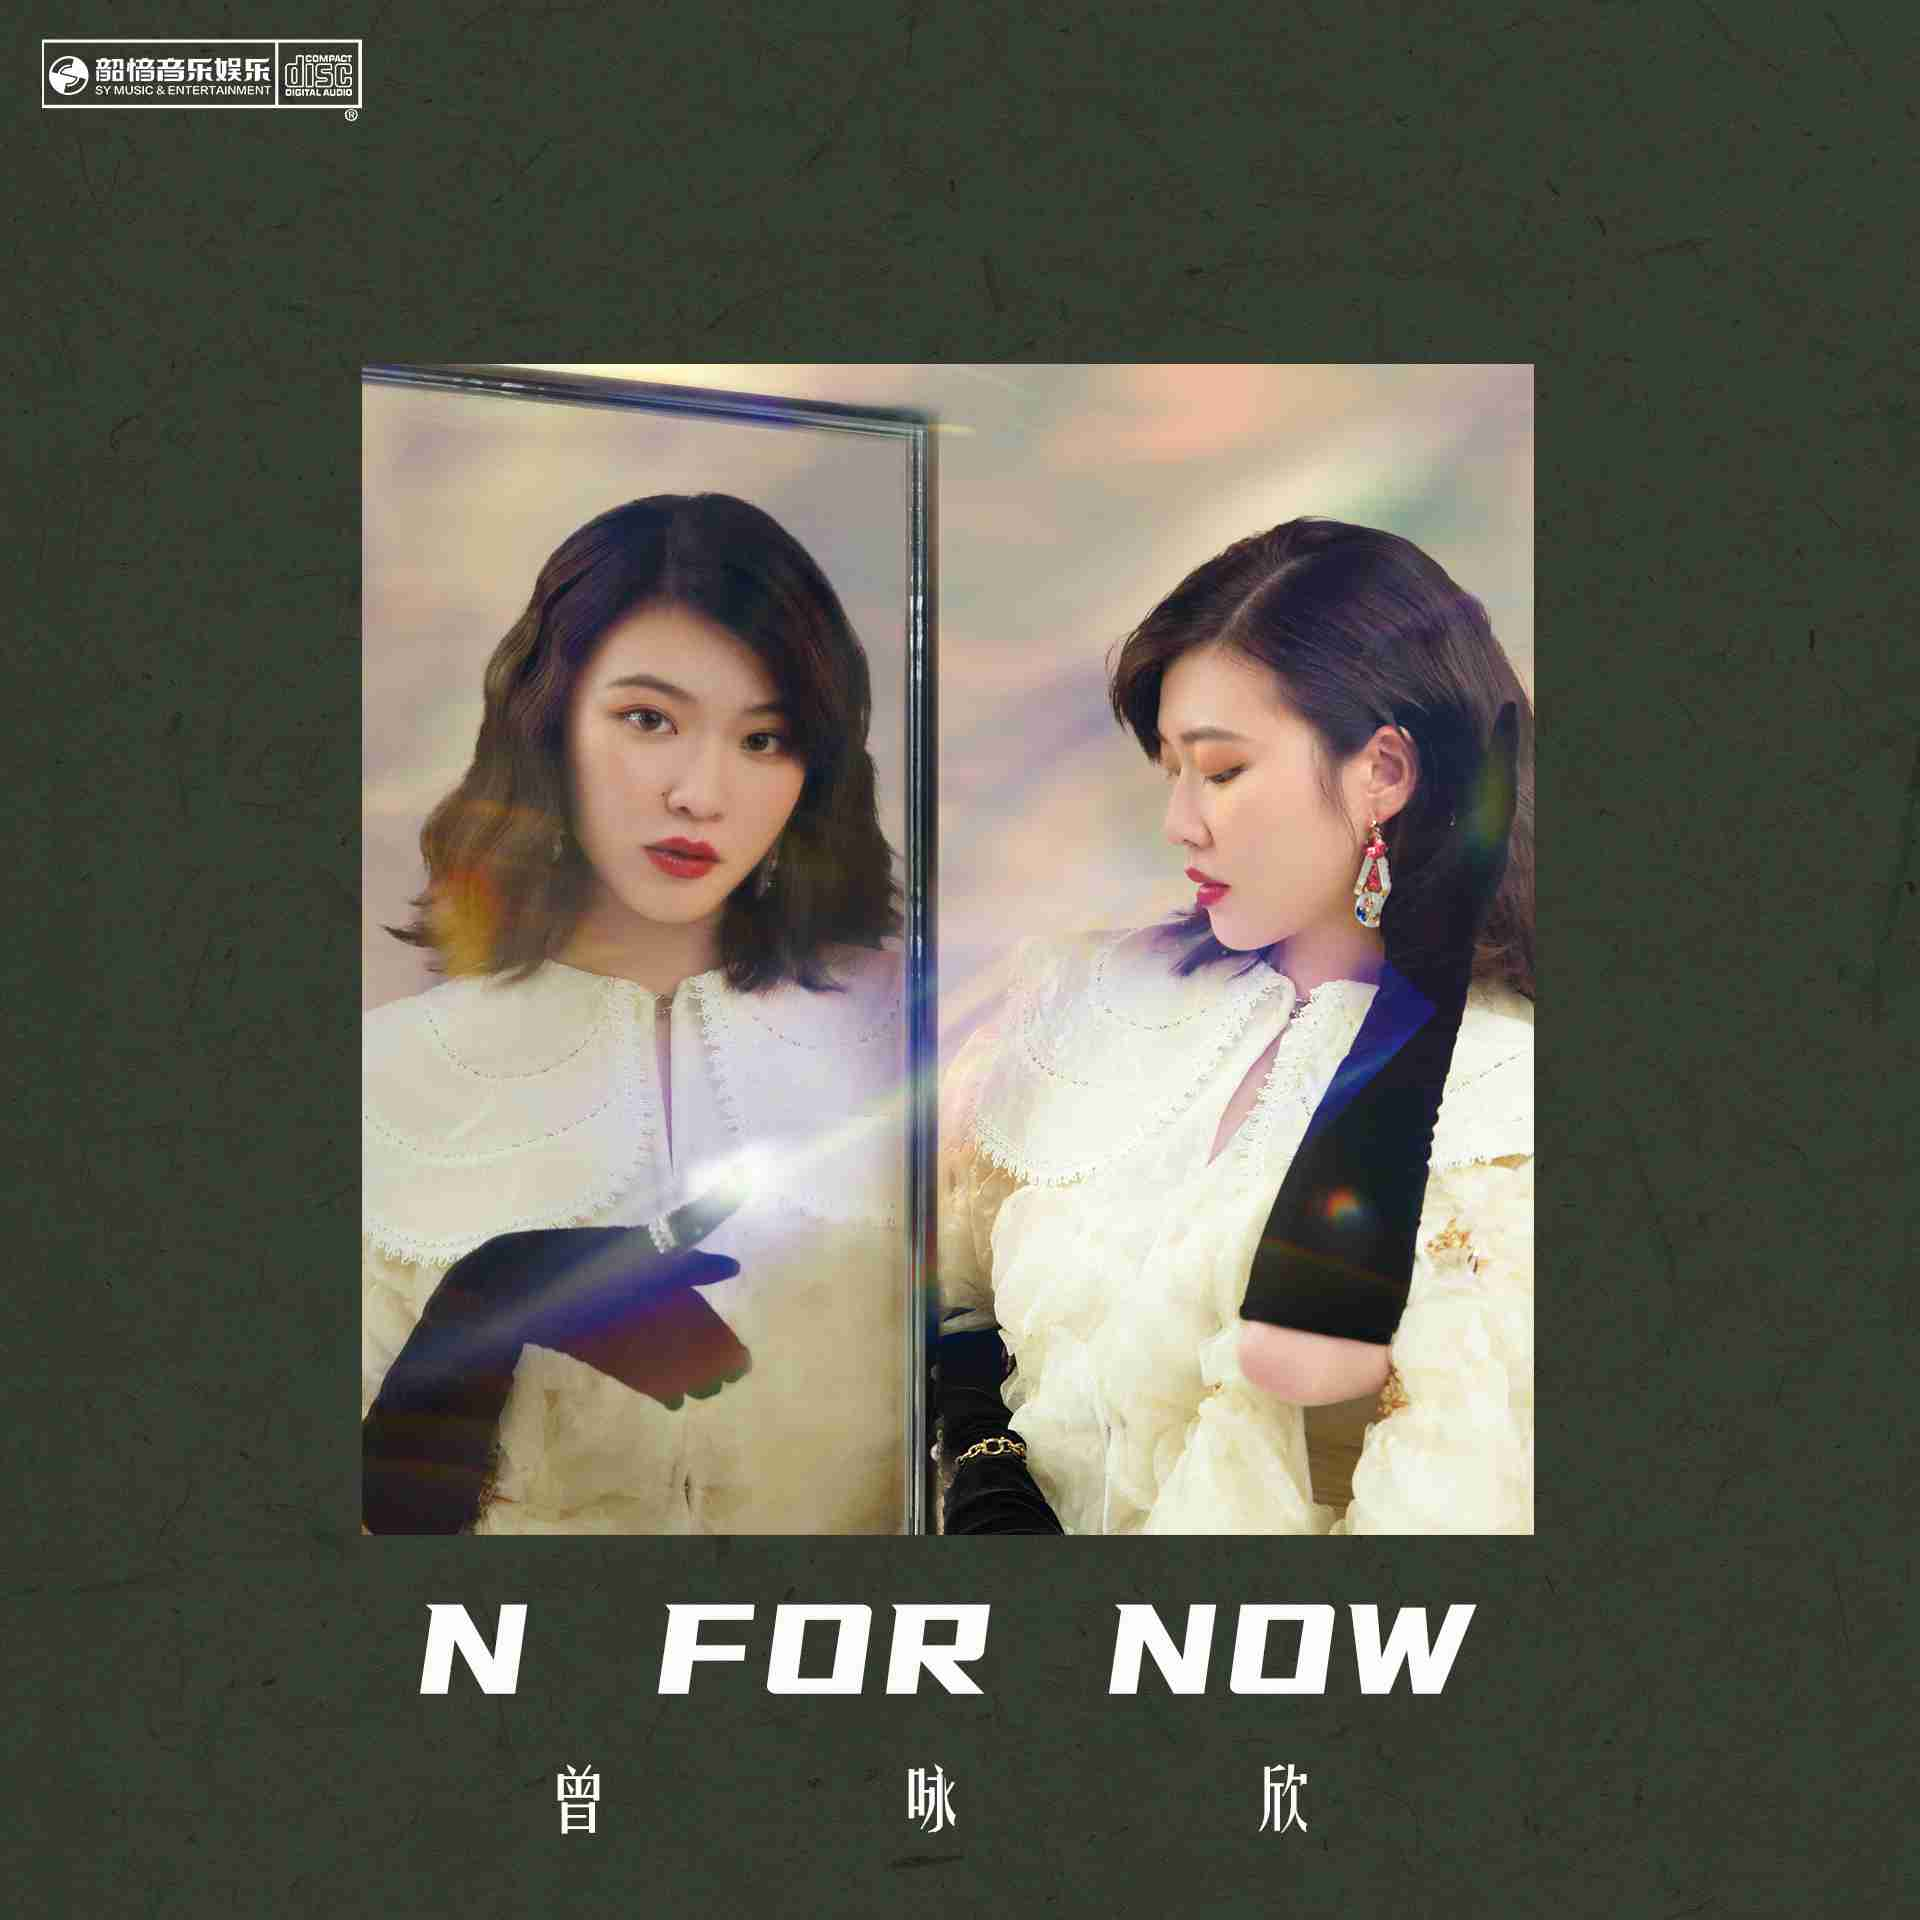 《N FOR NOW》封面_副本.jpg